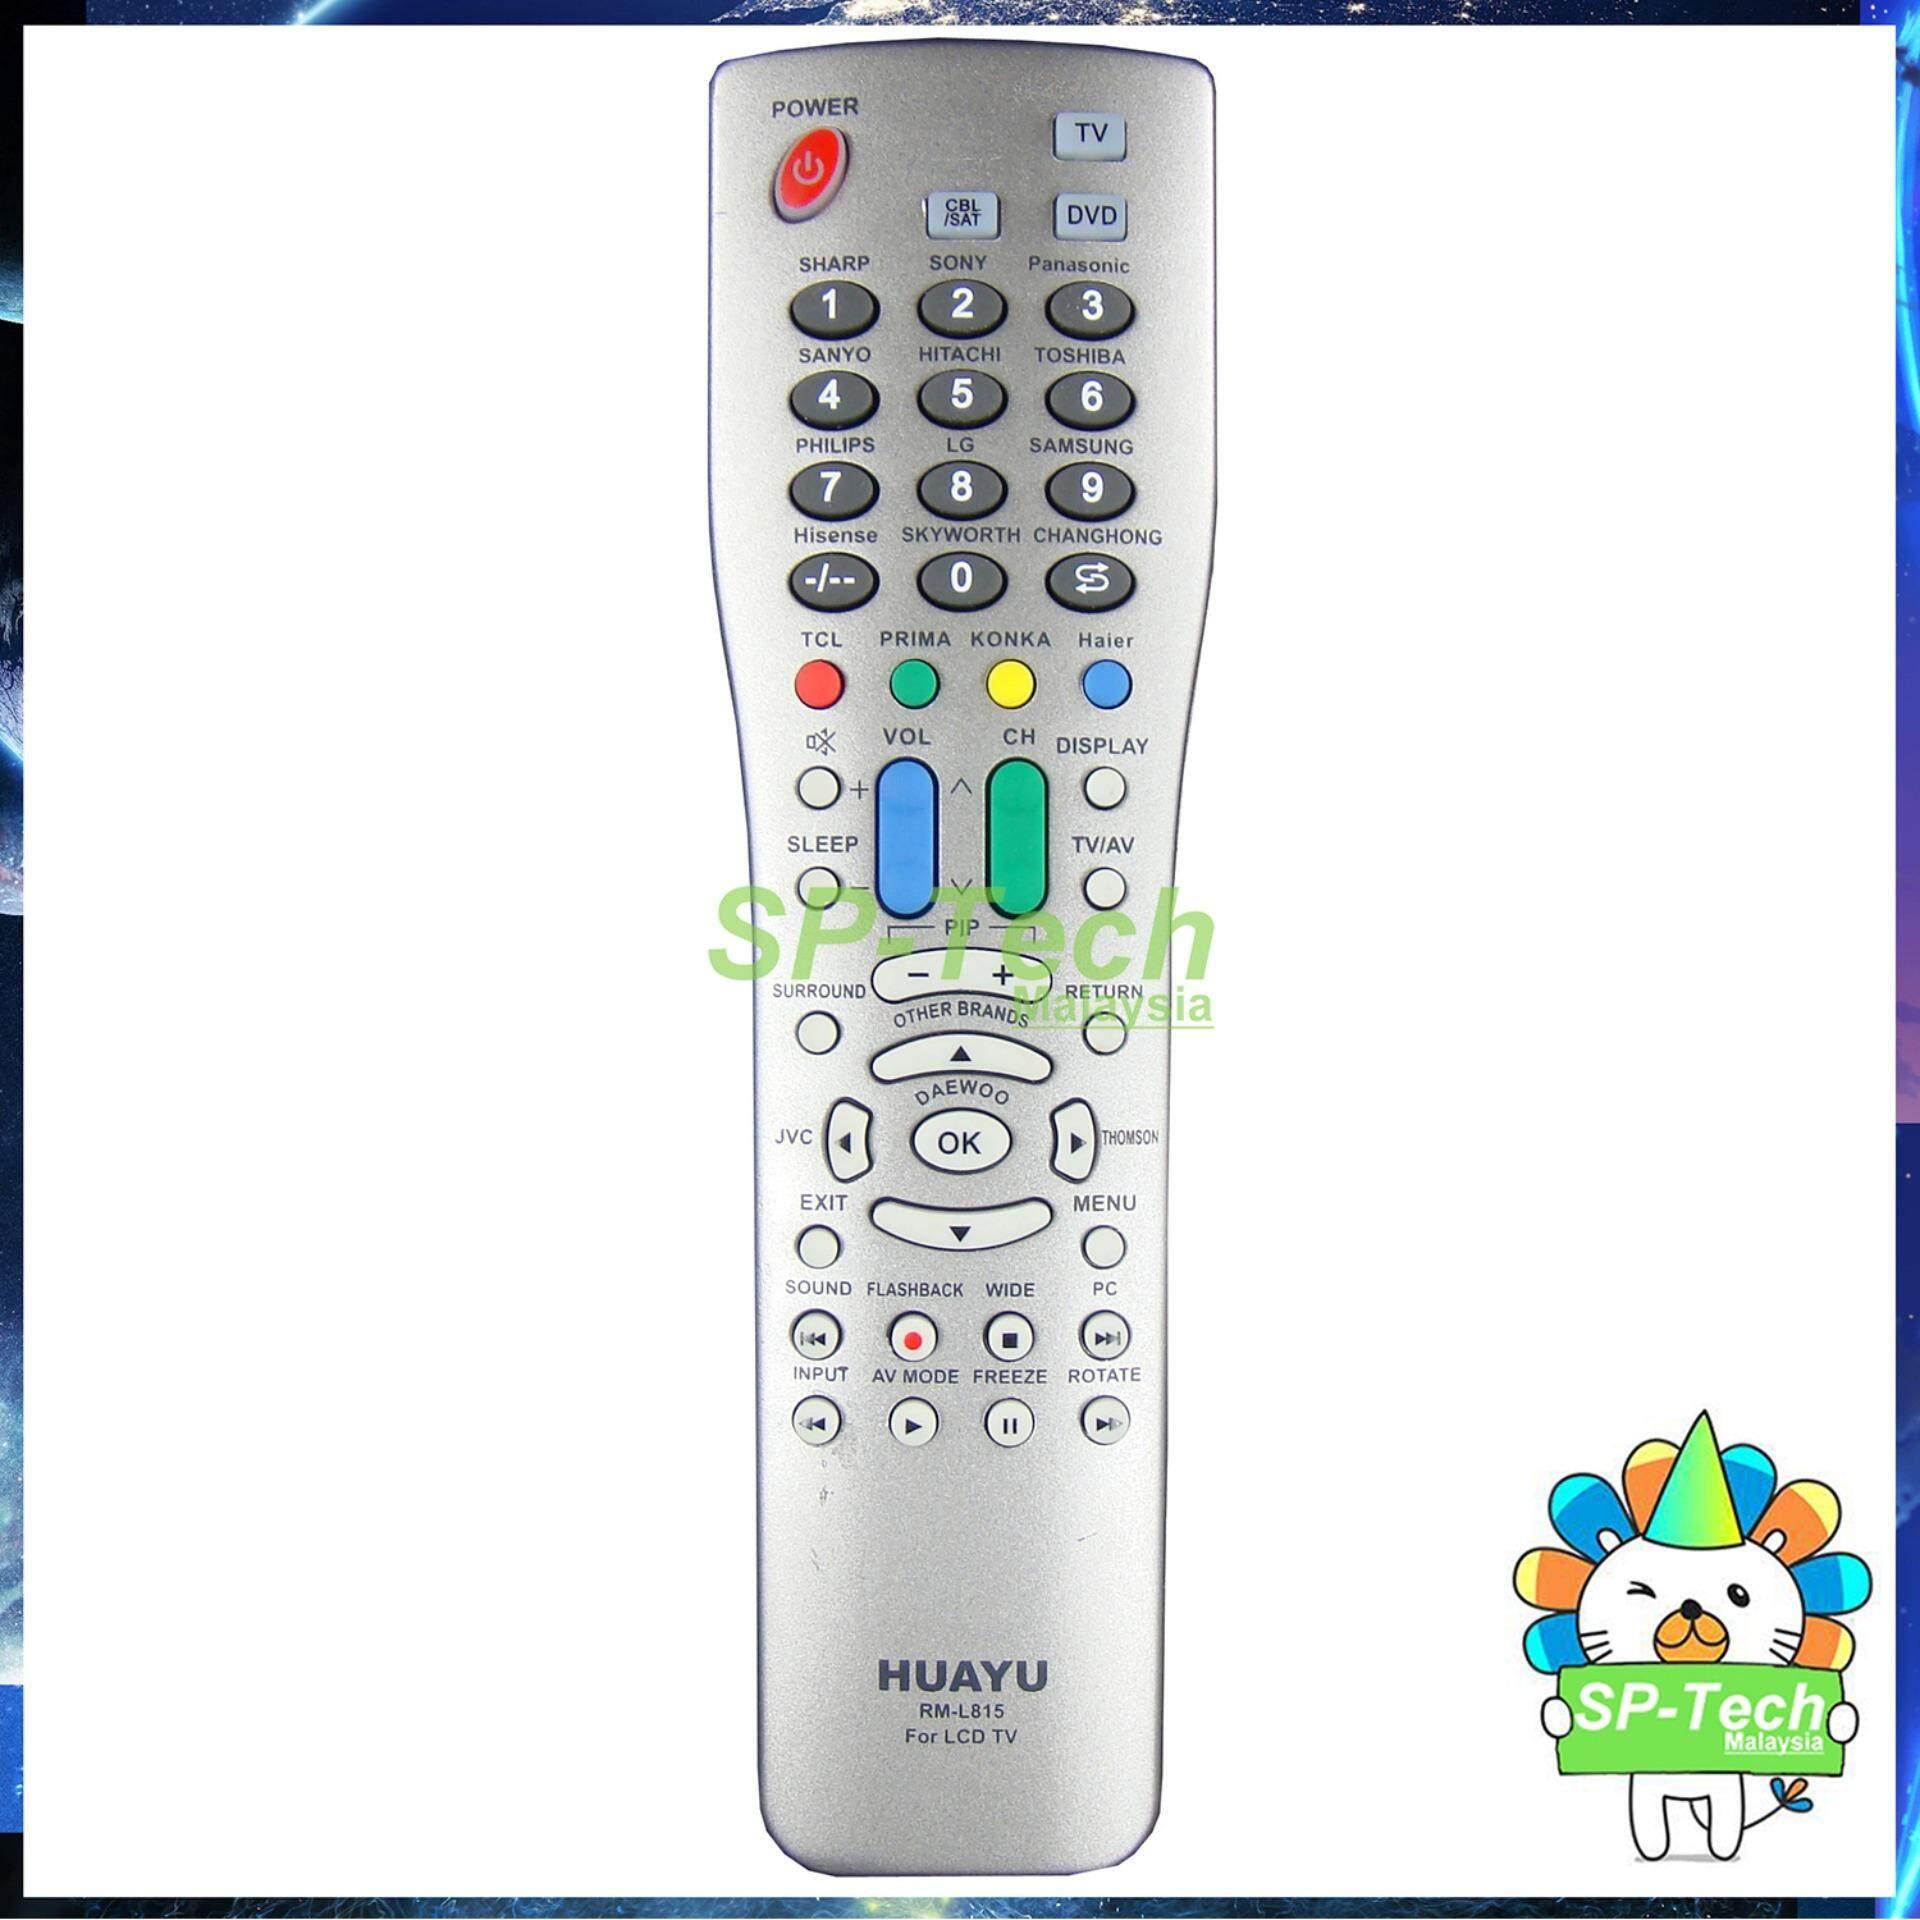 RM-L815 HUAYU UNIVERSAL LCD/LED TV REMOTE CONTROL